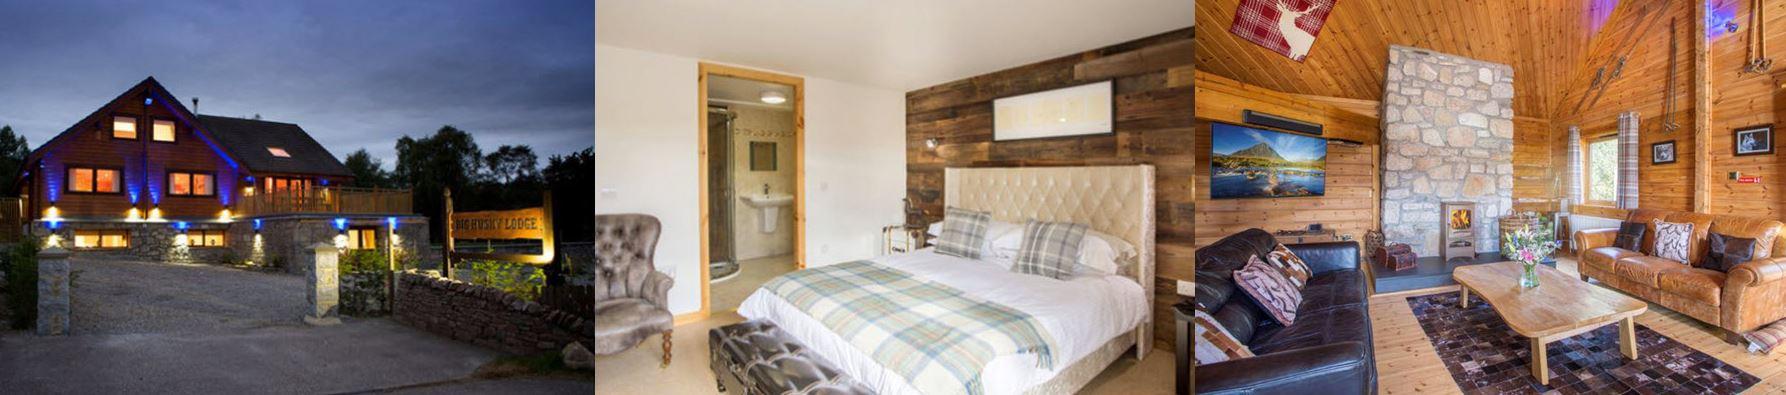 Luxury breaks Big Husky Lodge scotland